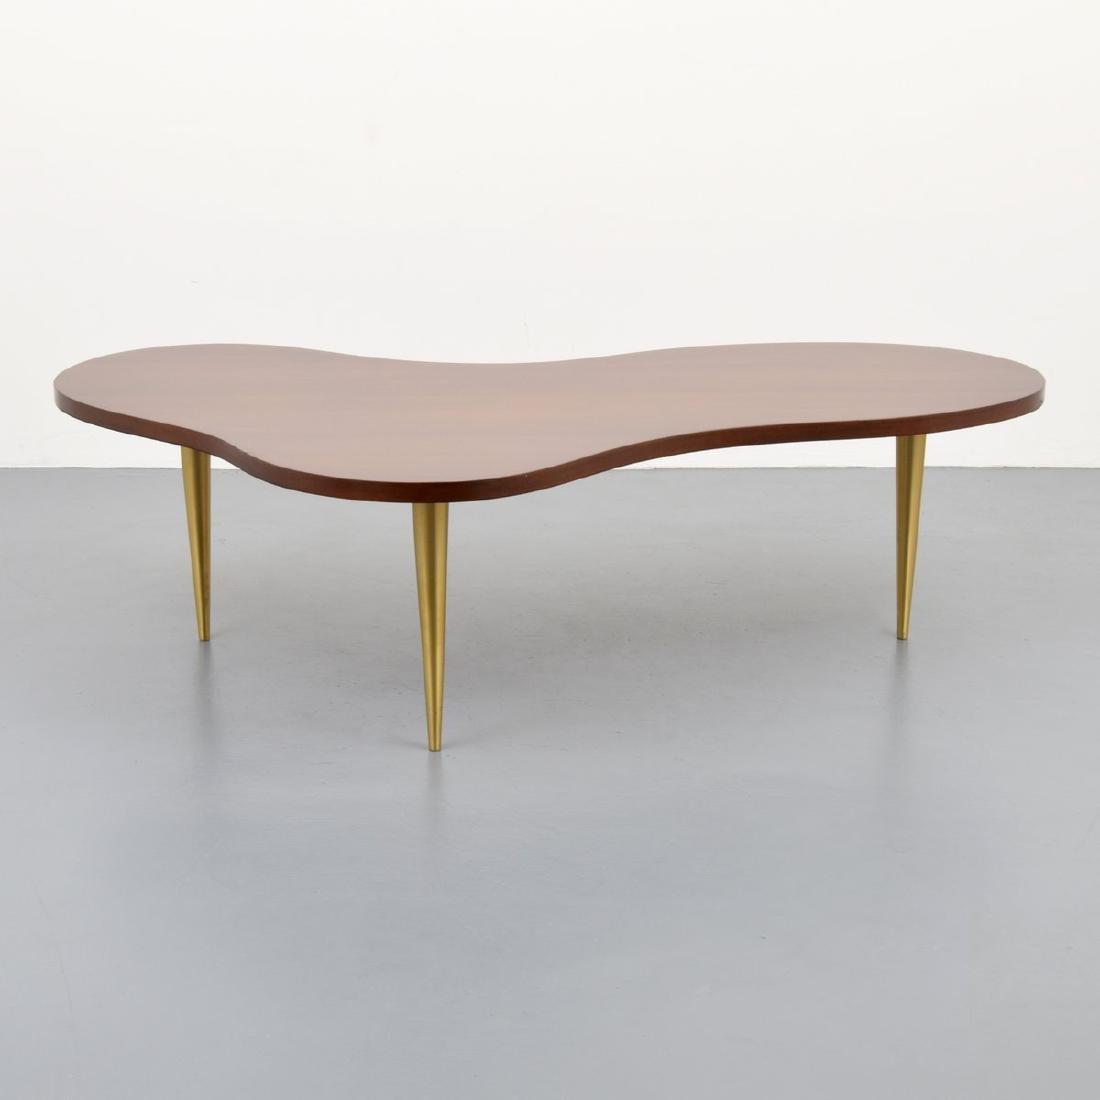 T.H. Robsjohn-Gibbings Biomorphic Coffee Table - 9